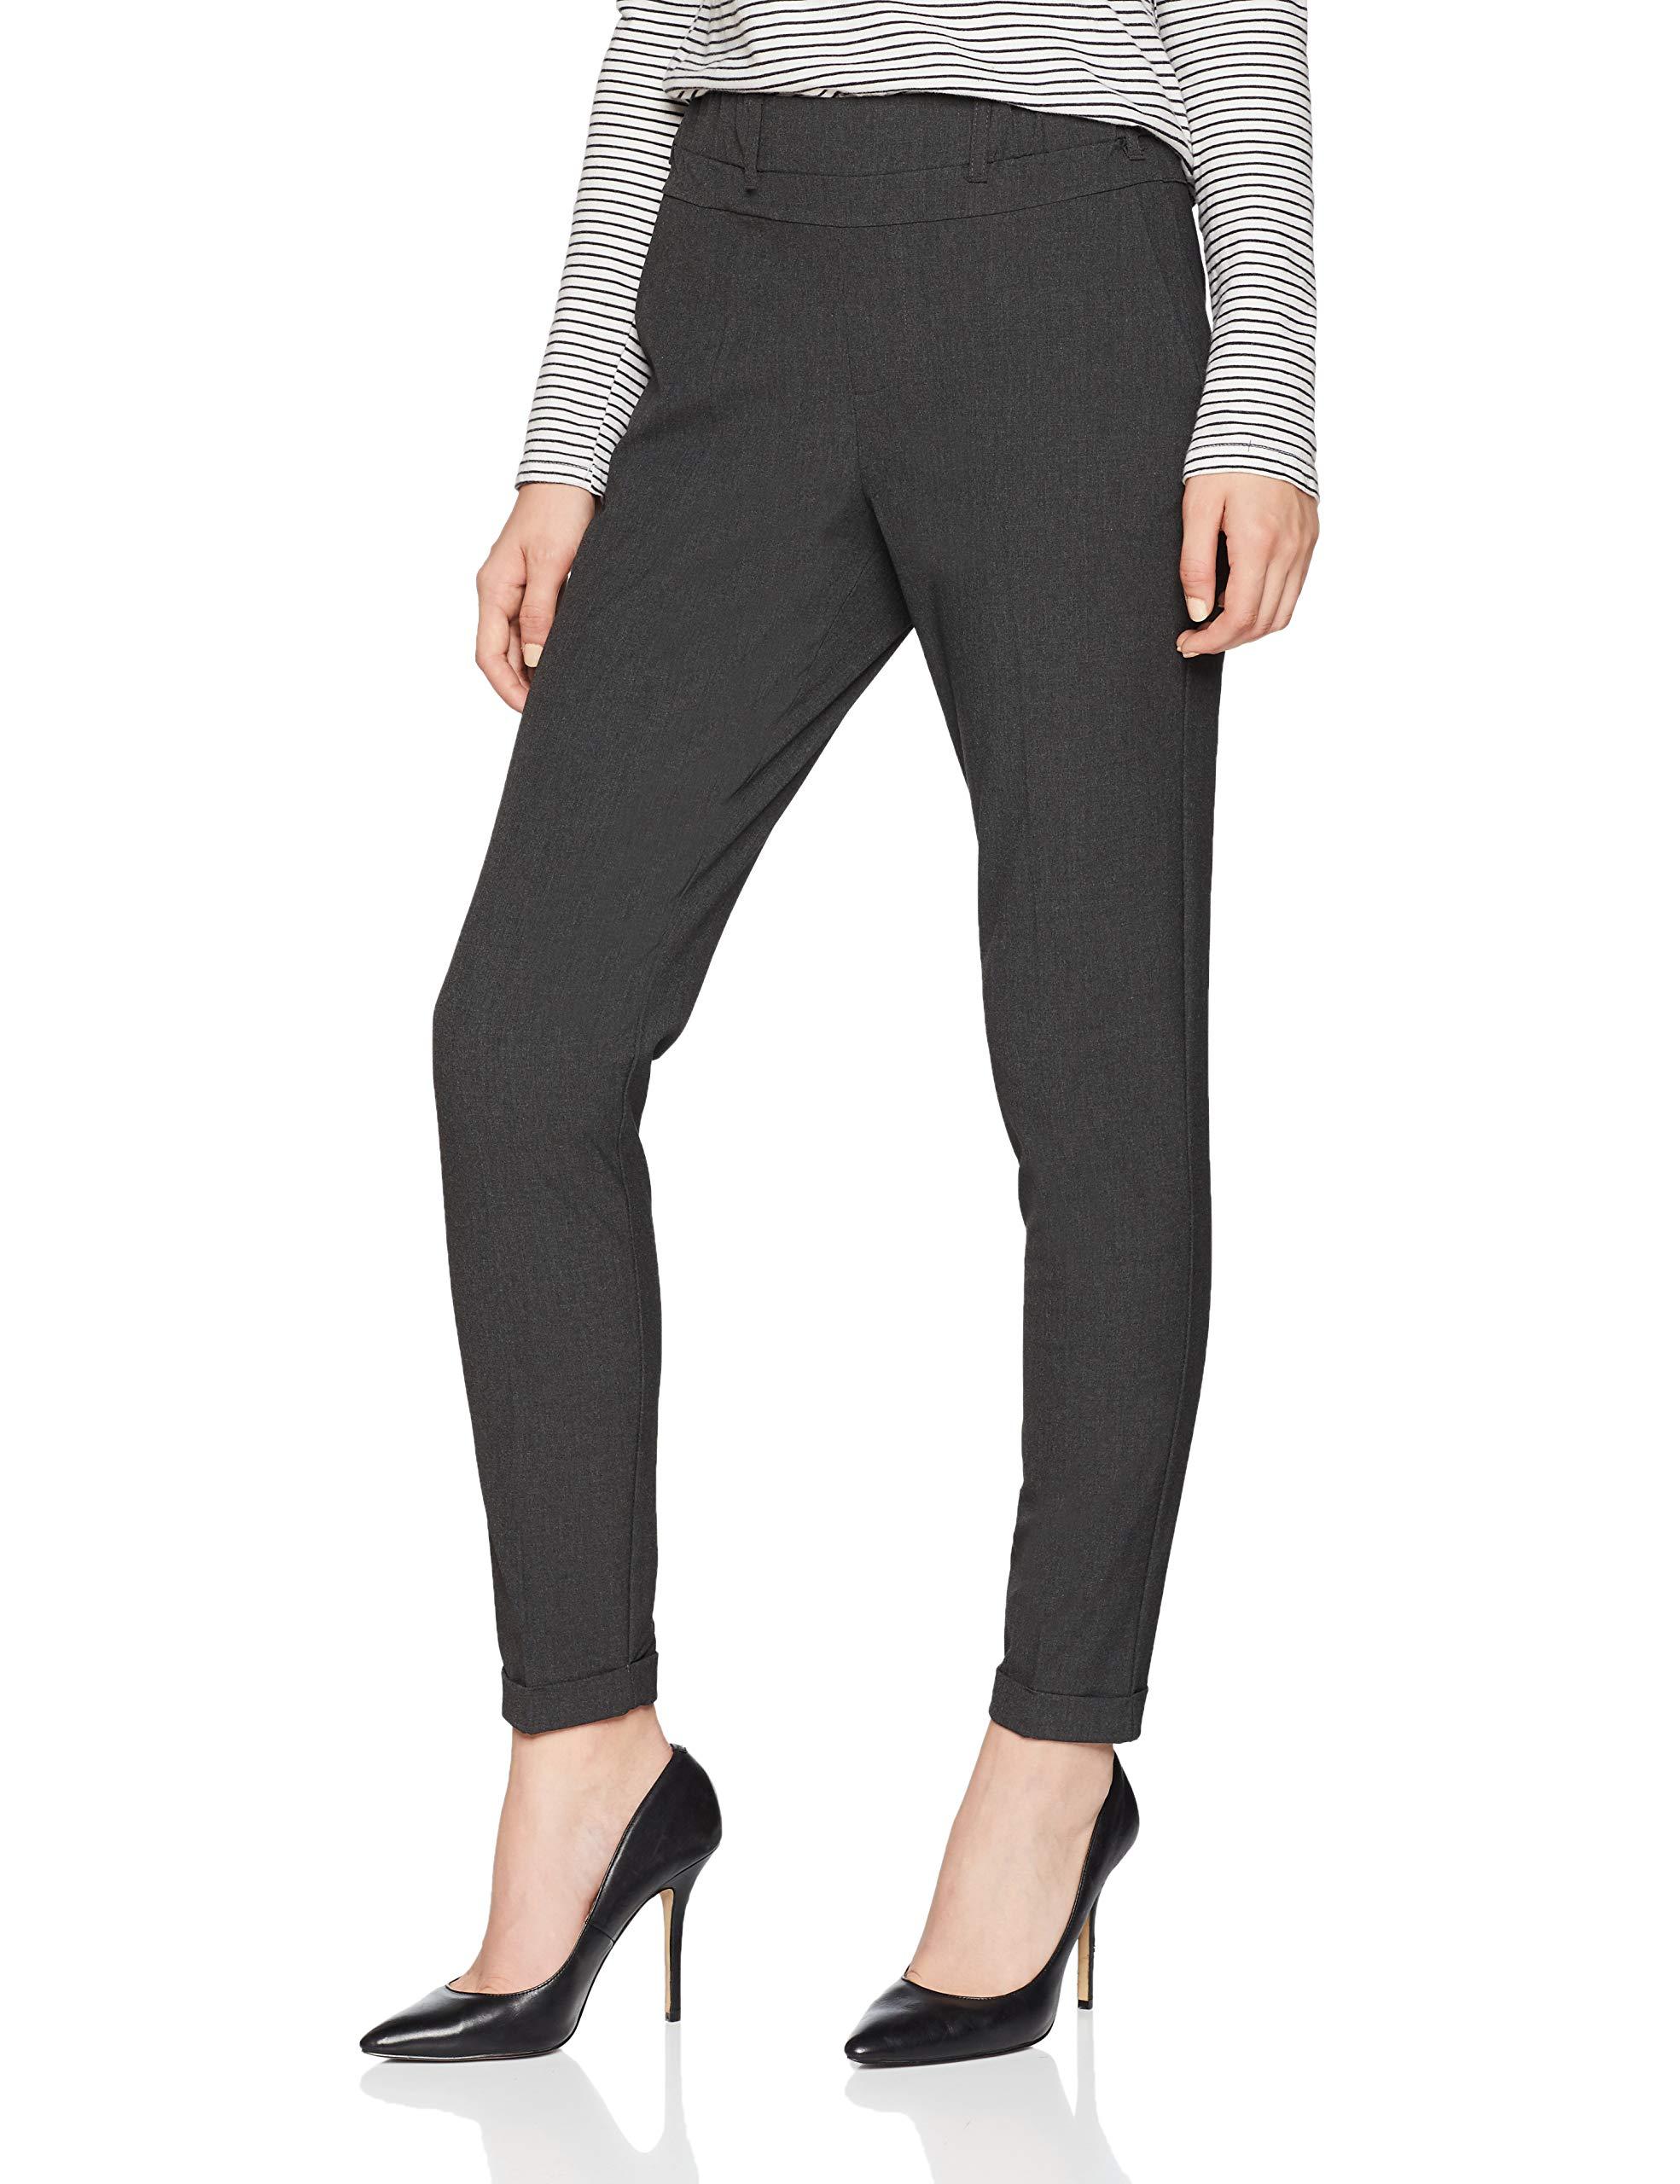 Nanci Melange Kaffe Grey 50016W25 Pant Jillian PantalonGrisdark Femme dxoCBerW